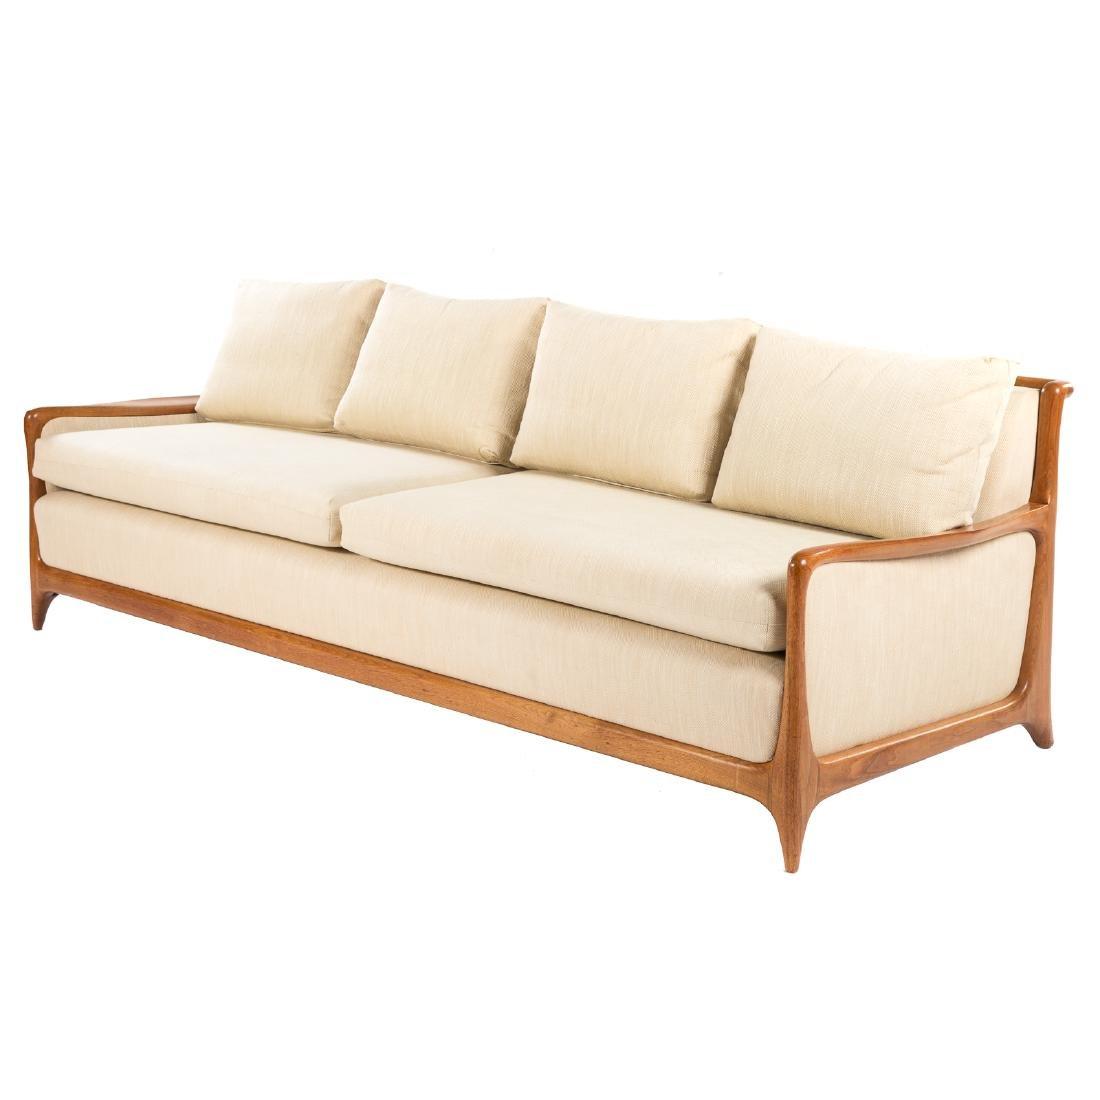 Vladimir Kagan - Dreyfuss walnut upholstered sofa - 2